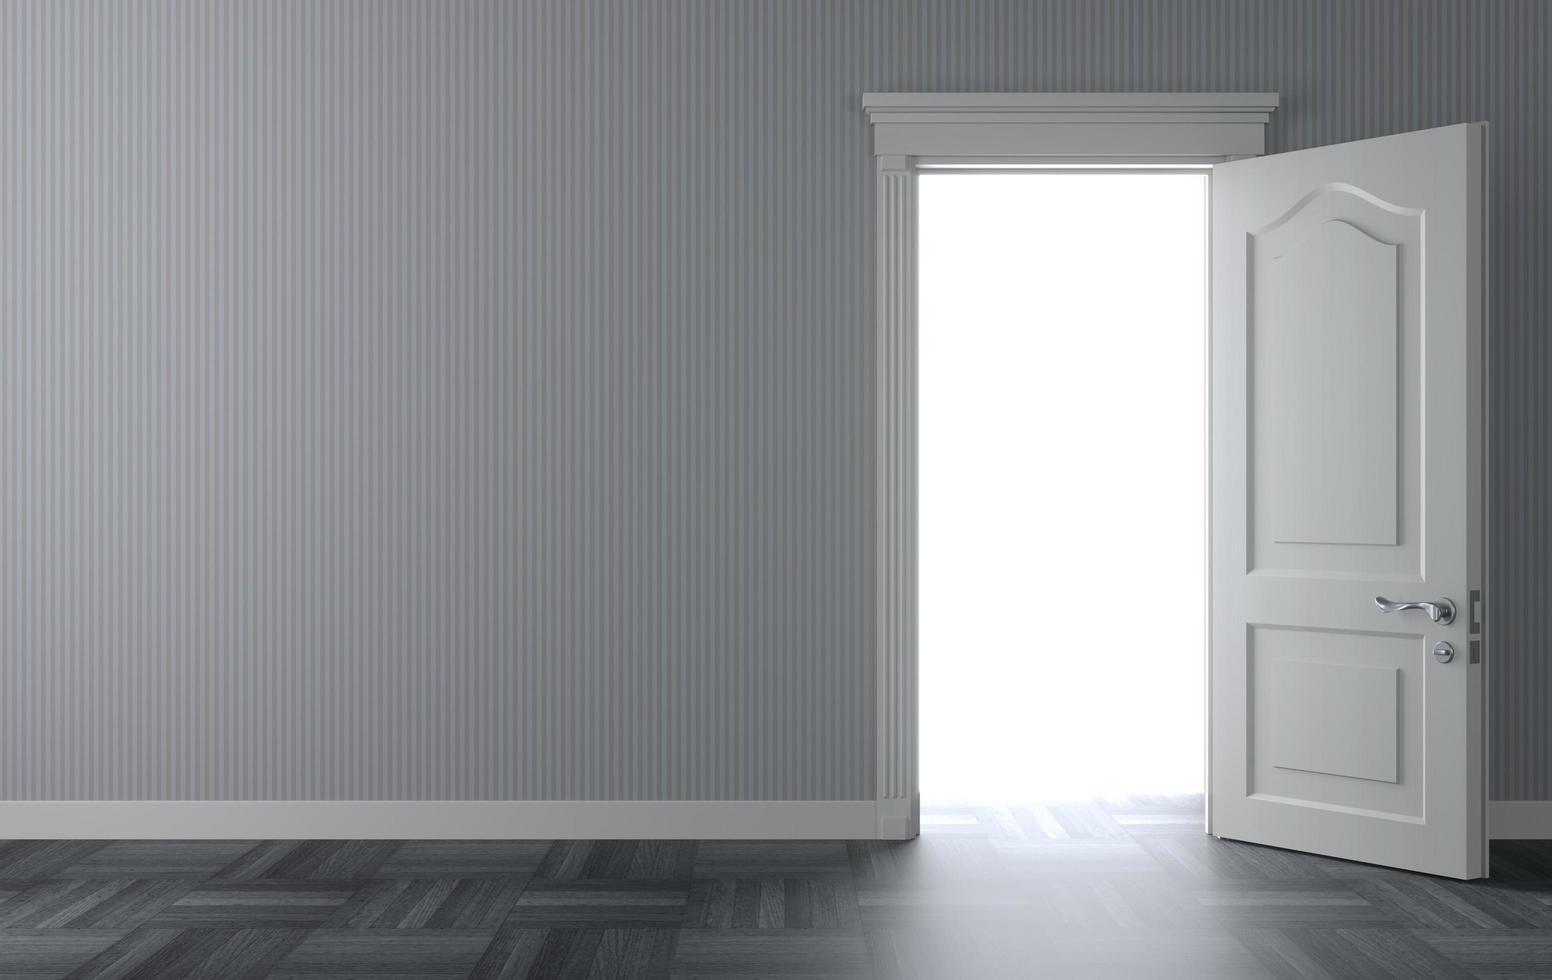 Classic white door 3D illustration photo